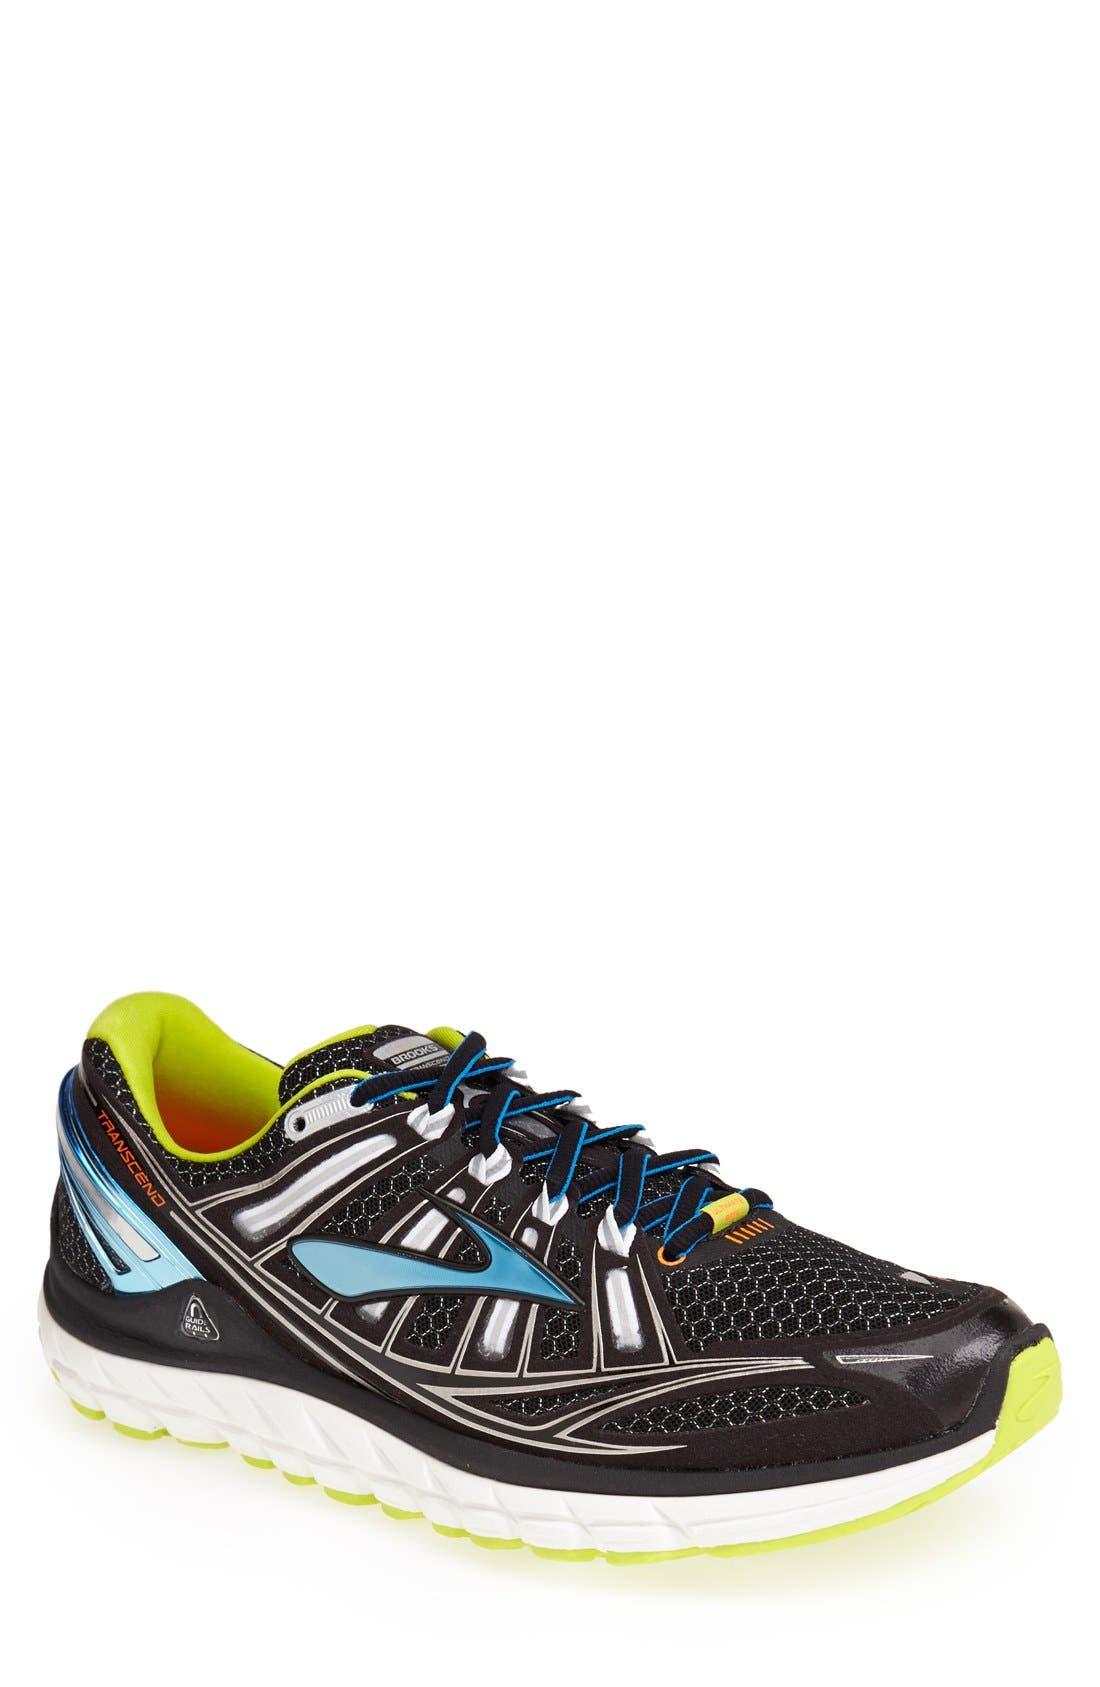 Main Image - Brooks 'Transcend' Running Shoe (Men)